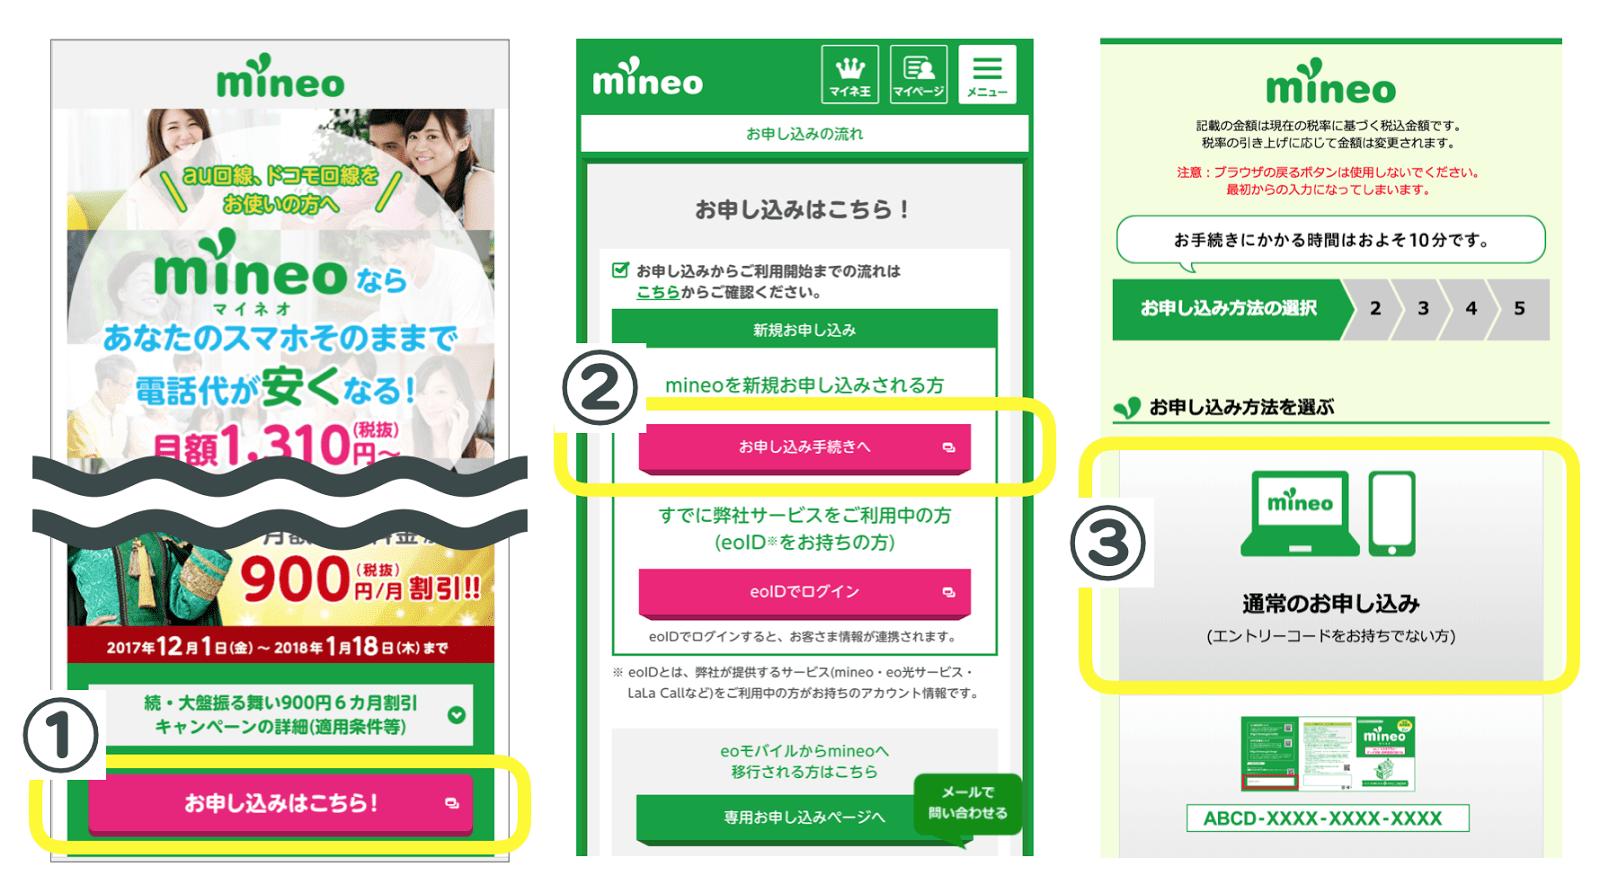 mineoの申込みページのキャプチャ画像